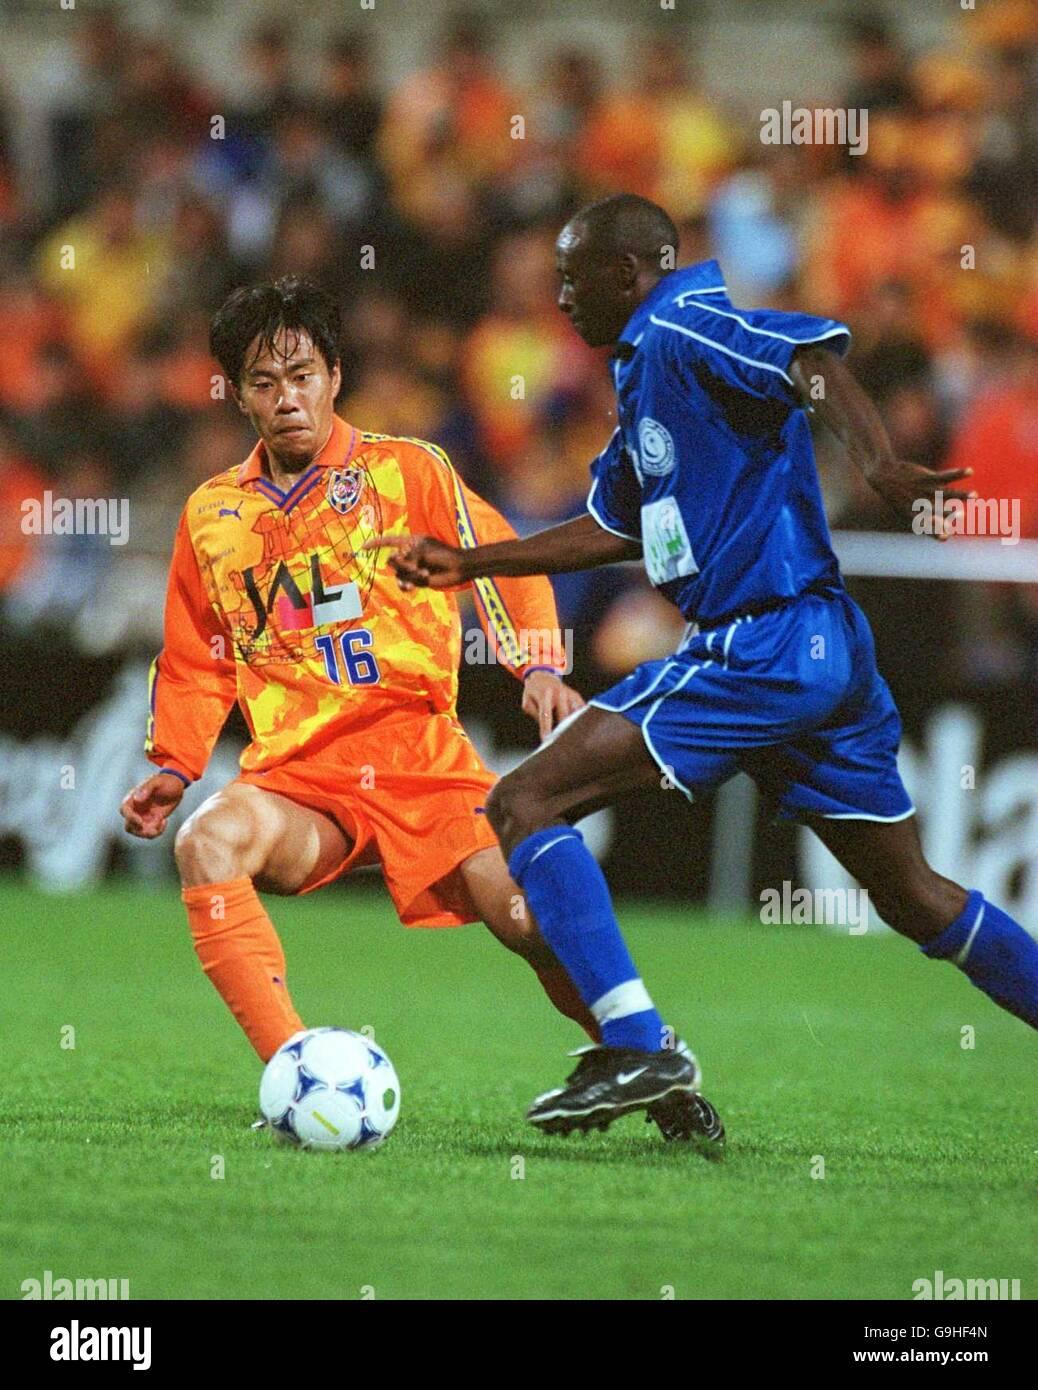 Asian Soccer - Asian Super Cup - Final - Shimizu S.Pulse v Al Hilal Stock Photo